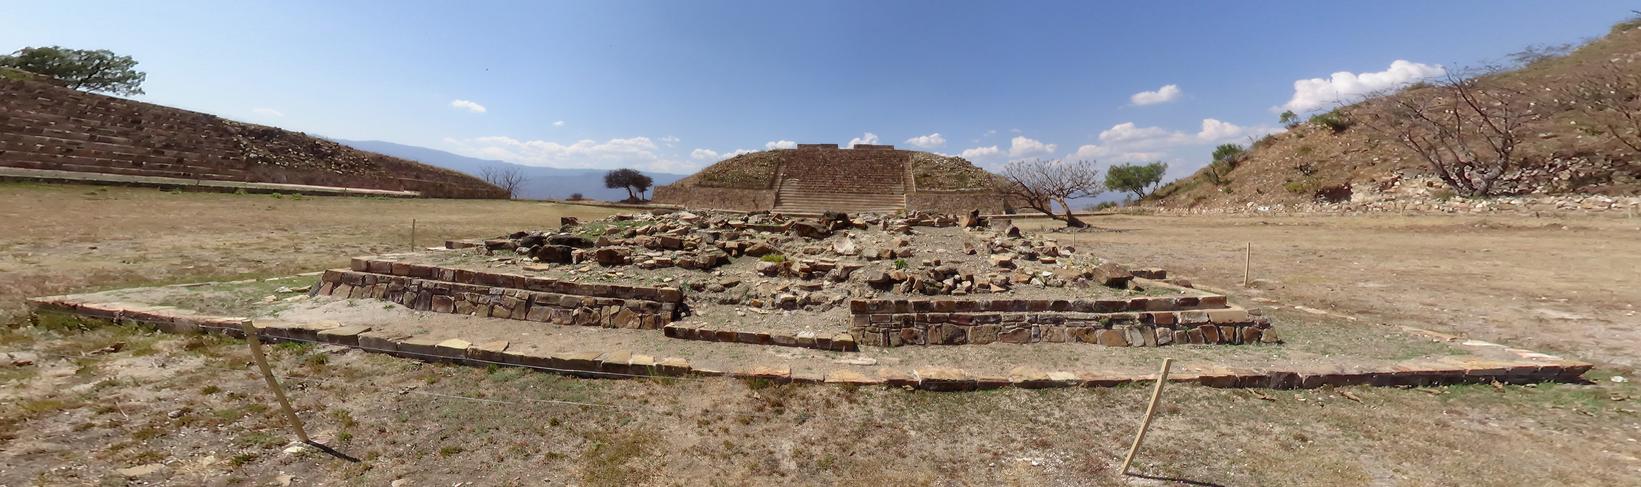 Oaxaca Mexico Pyramid Pano 1 by ALCHEMlST